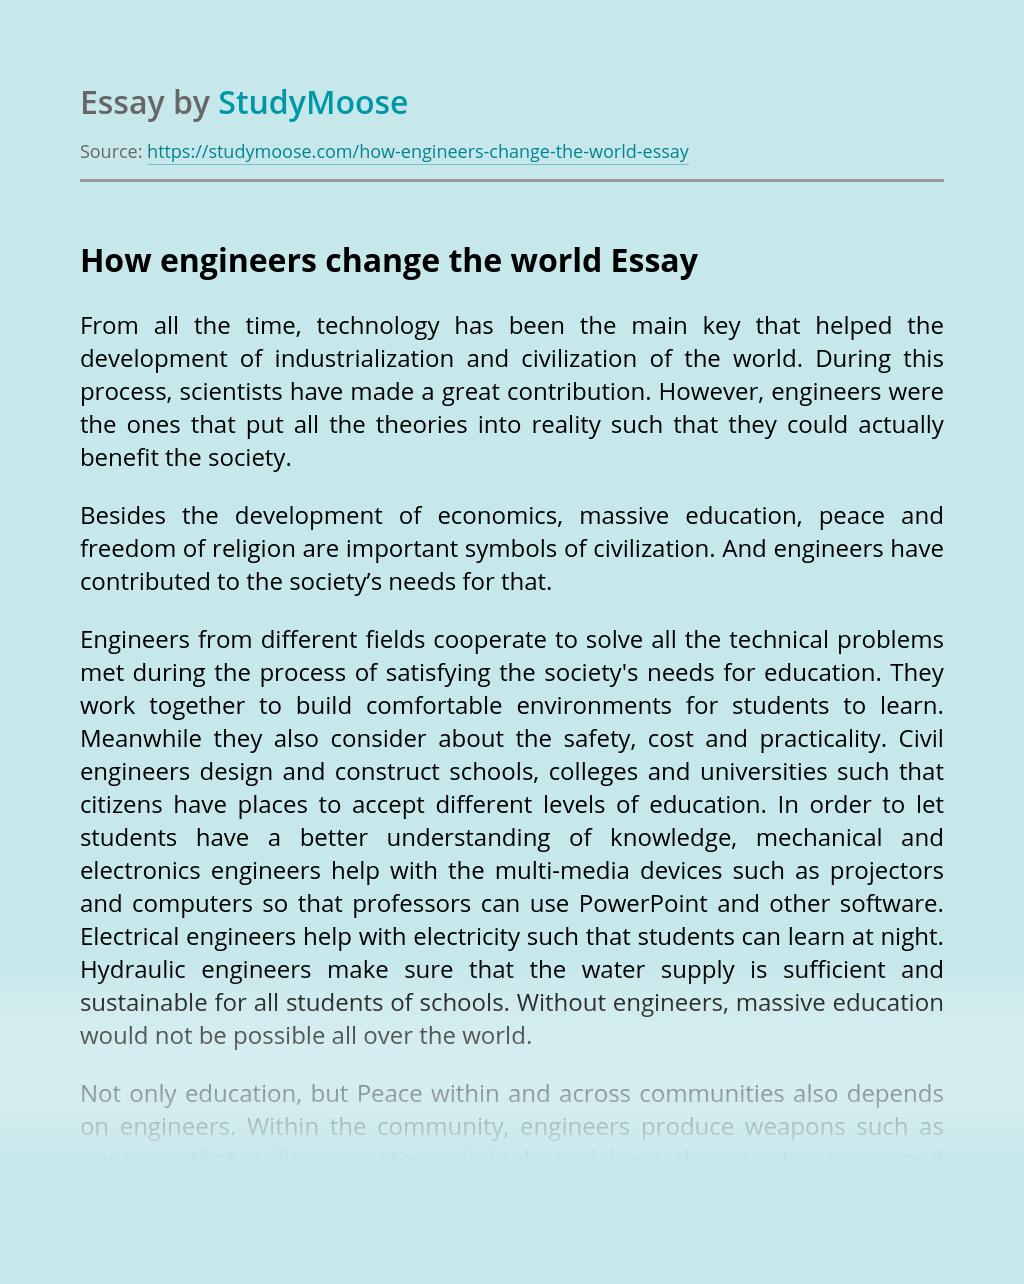 How engineers change the world?